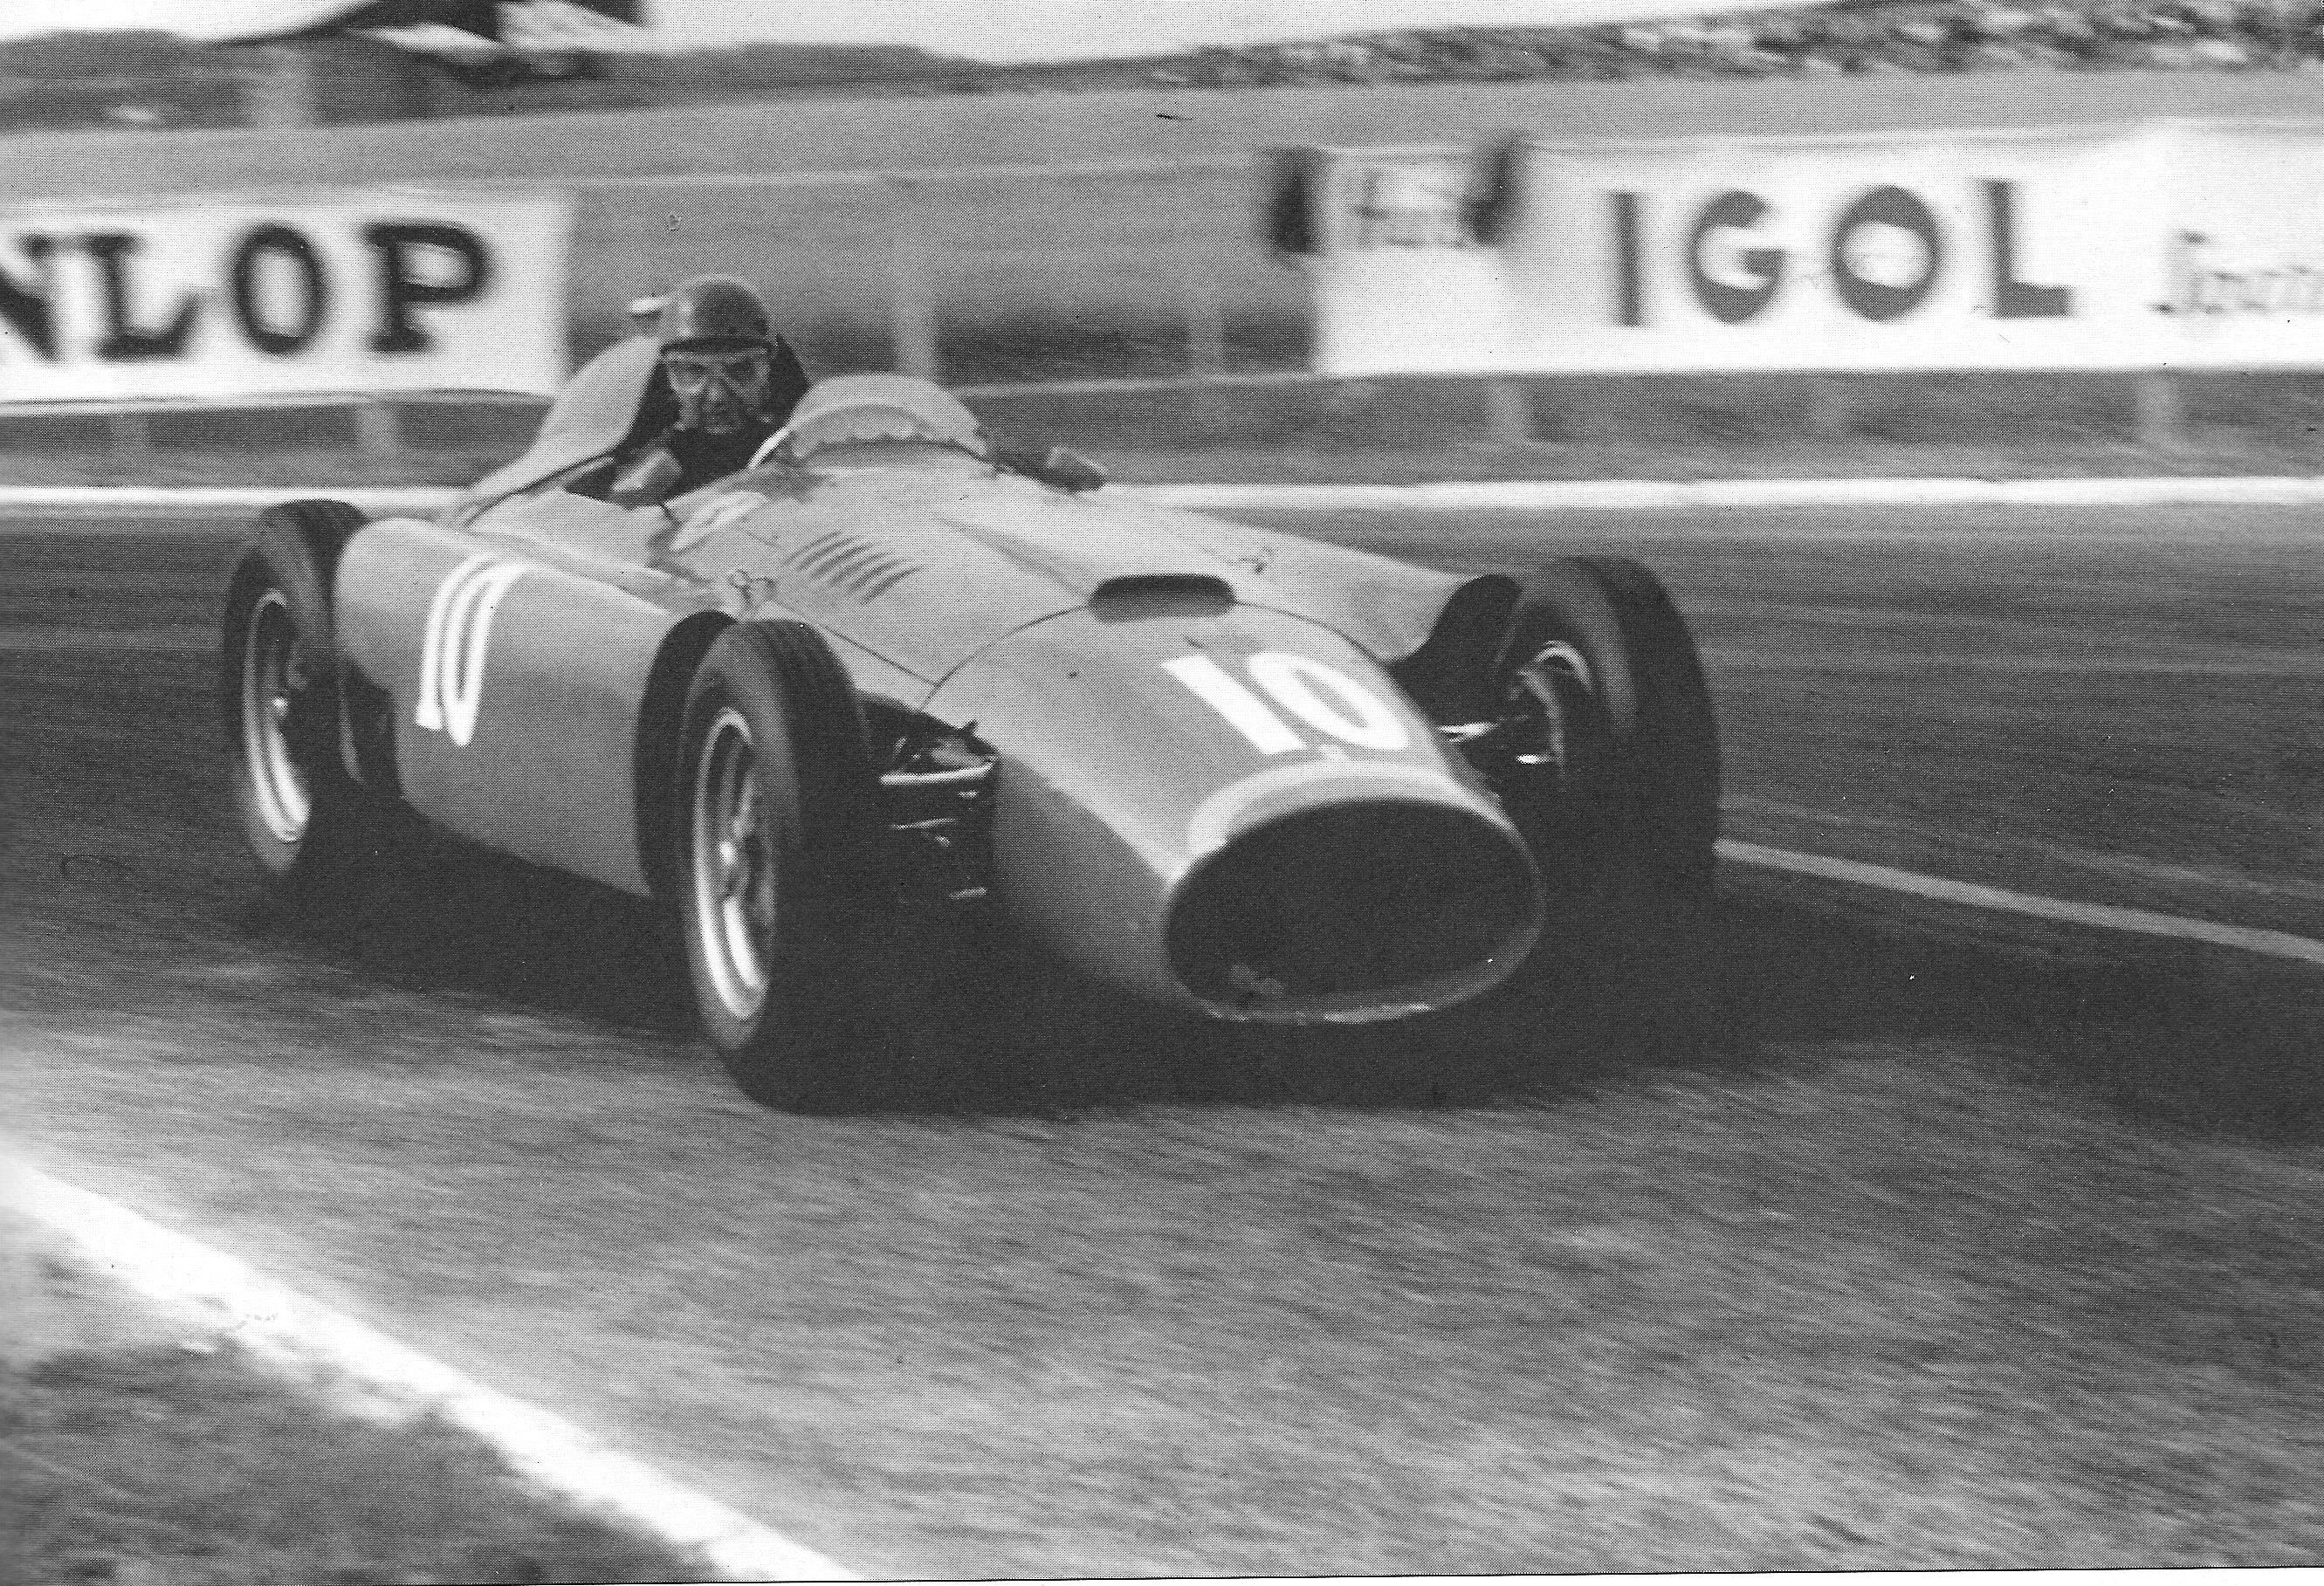 Lancia ferrari d50 at thompson speedway vintage event fangio lancia ferrari d50 1956 vanachro Gallery